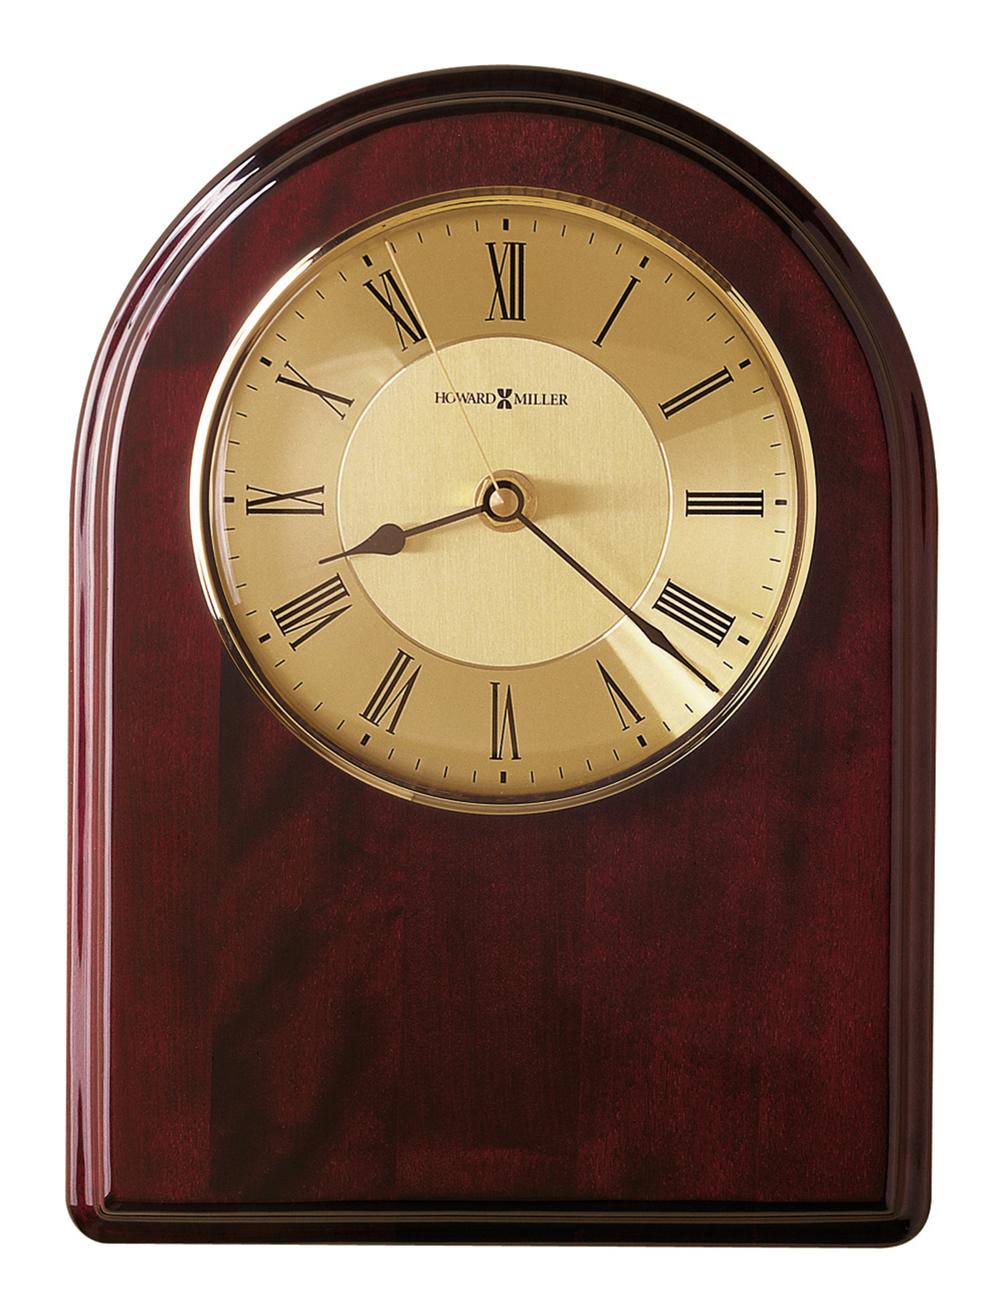 Howard Miller Clock - Honor Time III Wall Clock